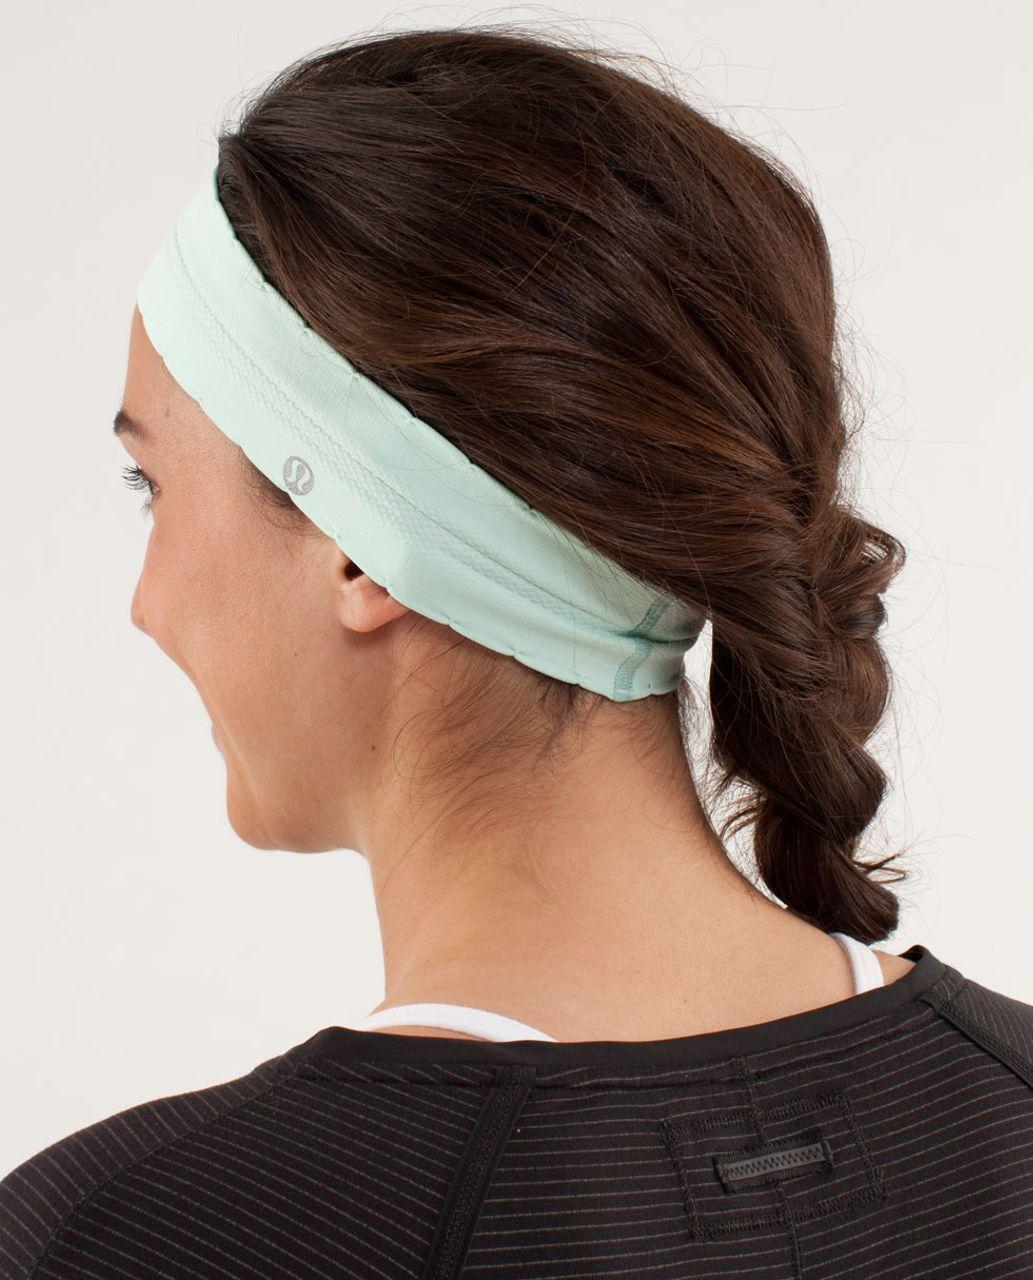 Lululemon Swiftly Headband - Mint Moment